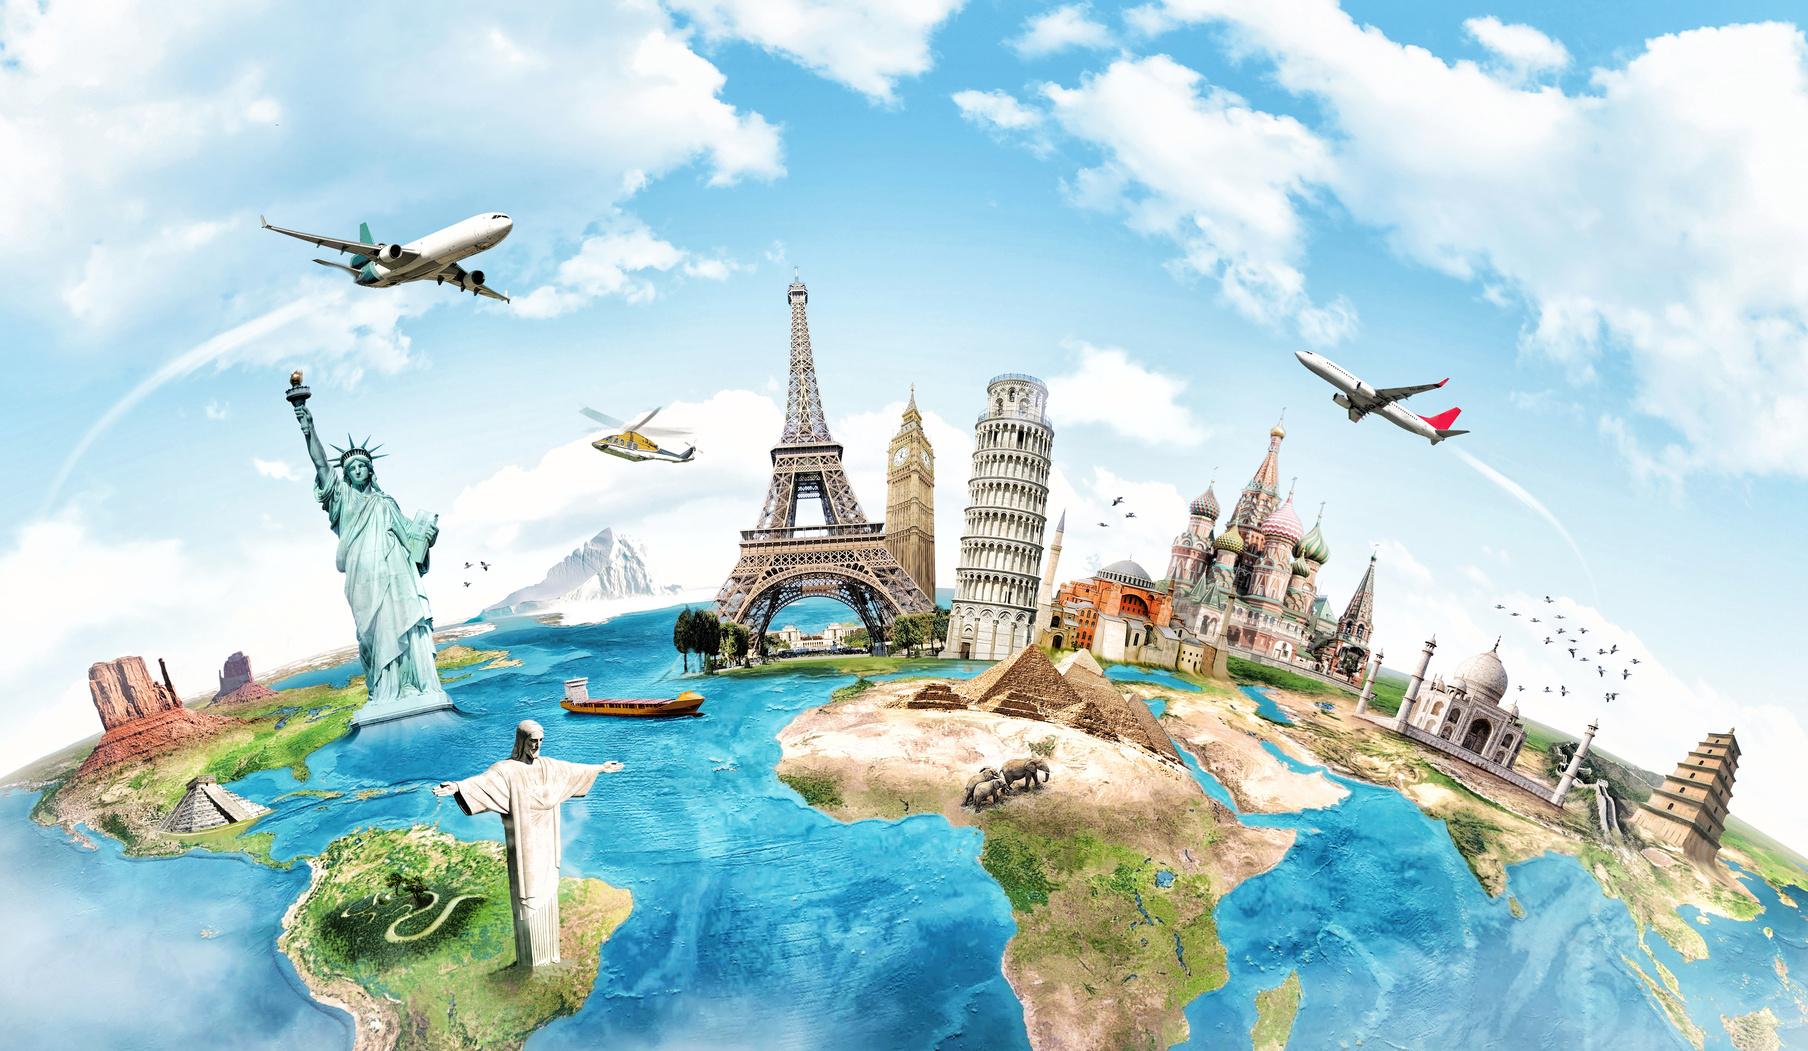 Ratgeber Reisen Ohne Kreditkarte 187 Travel Dealz De